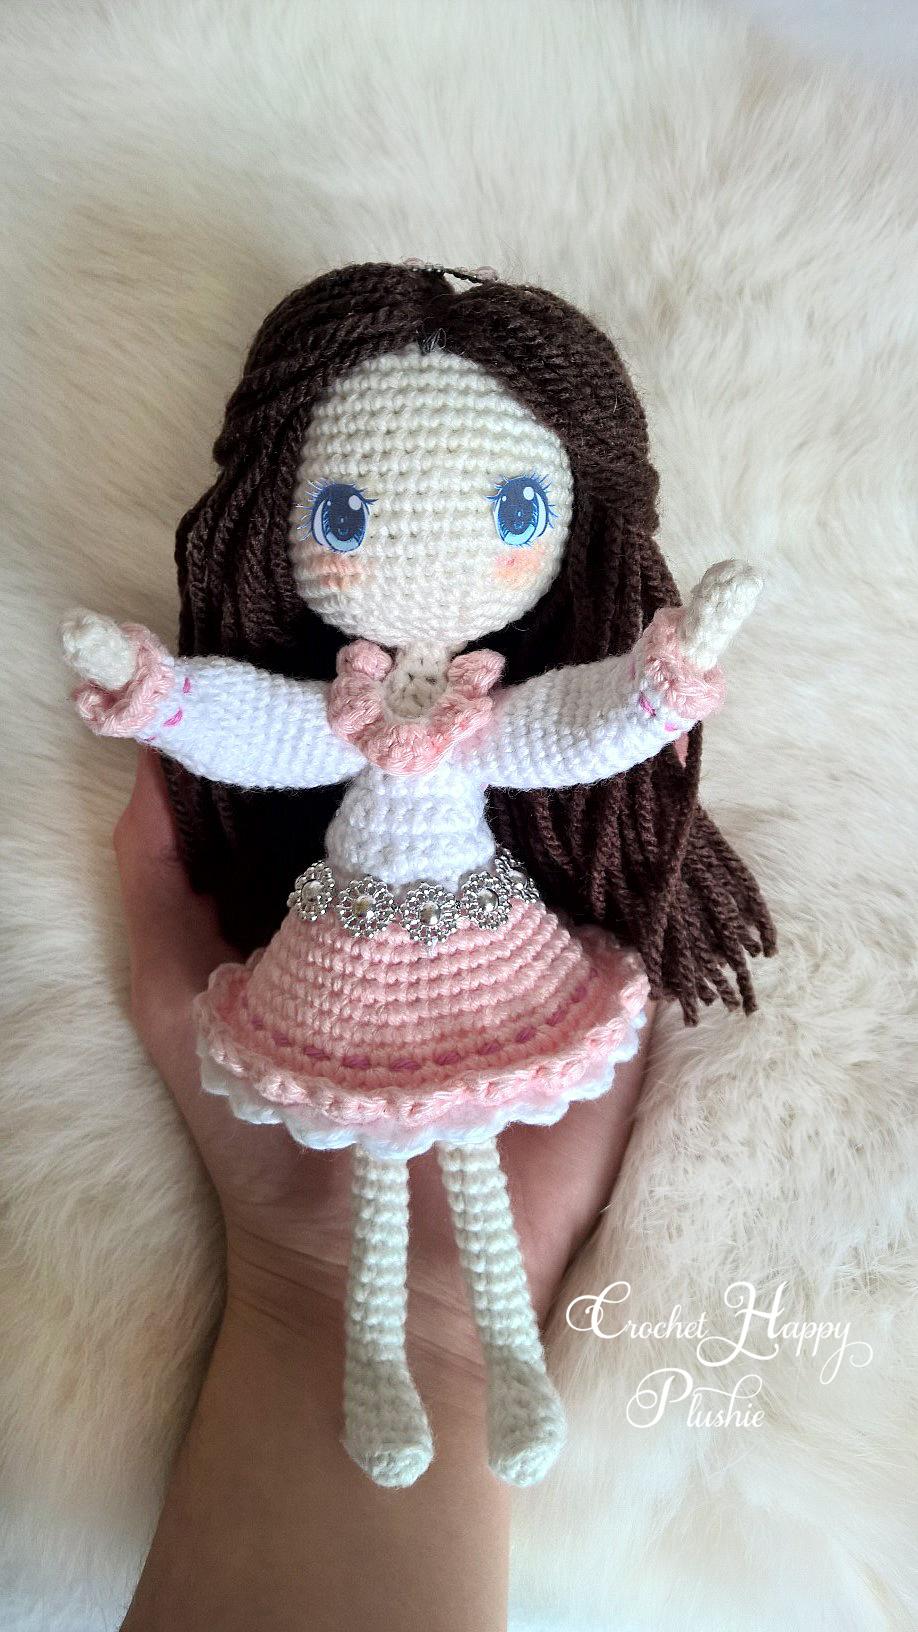 Amigurumi Doll Anime : crochet amigurumi doll anime - prototype1 by Shia ...